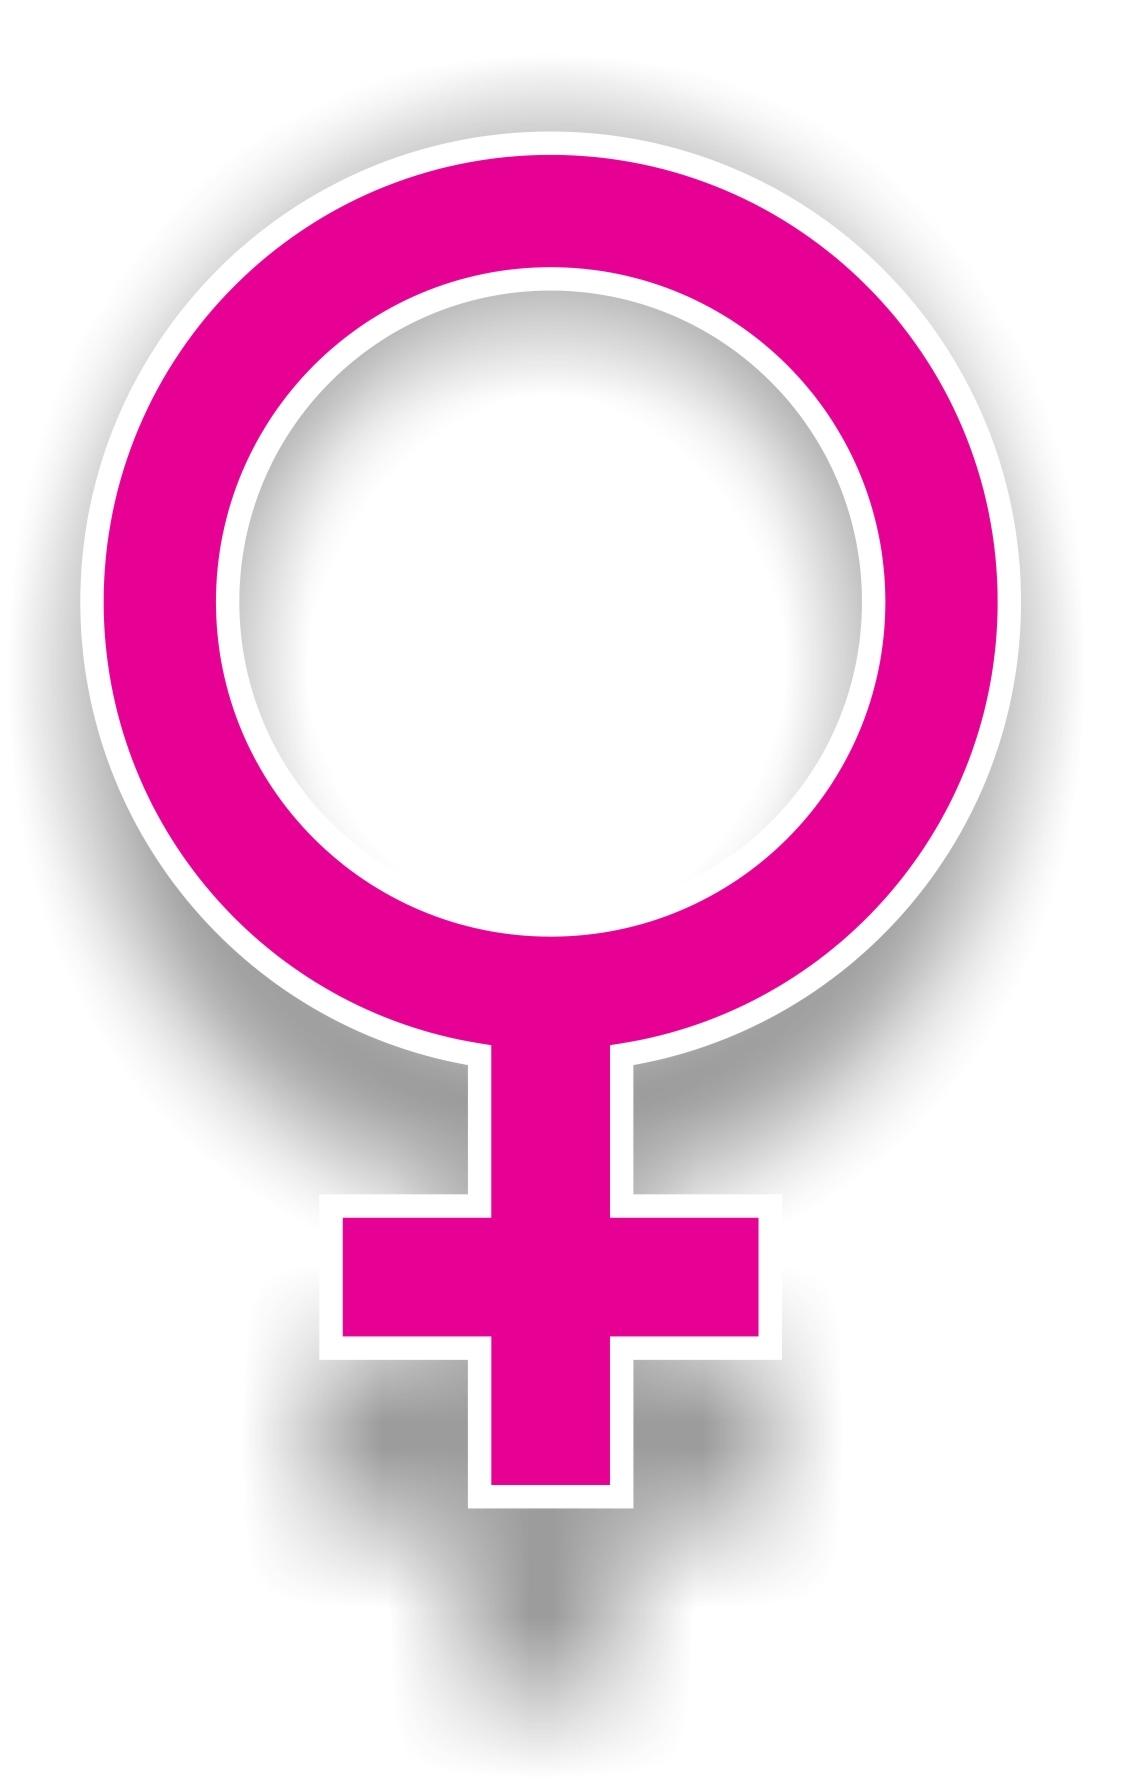 gender-symbols-1161576.jpg